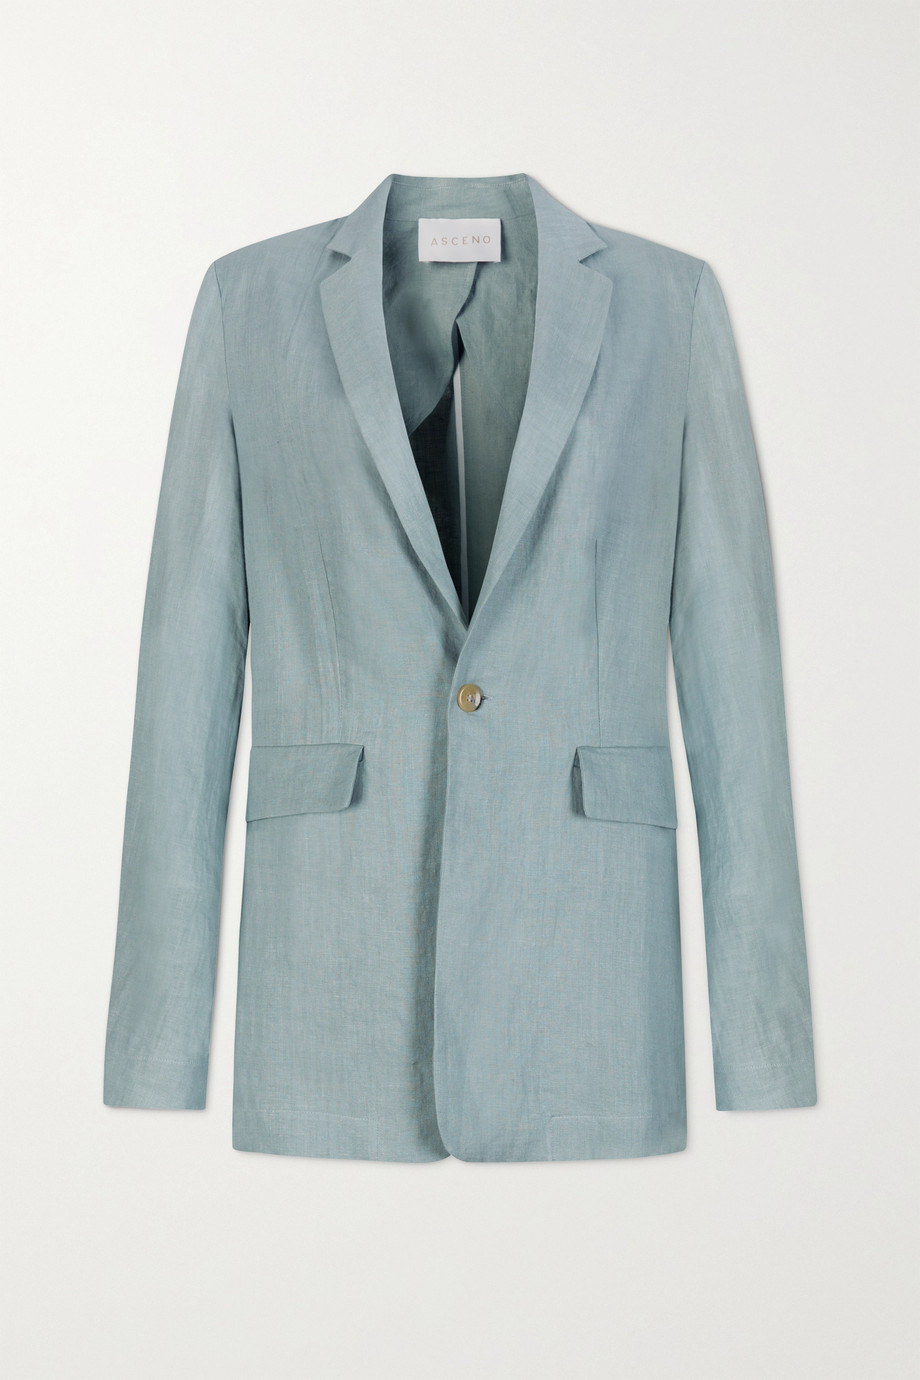 ASCENO Azores oversized organic linen blazer